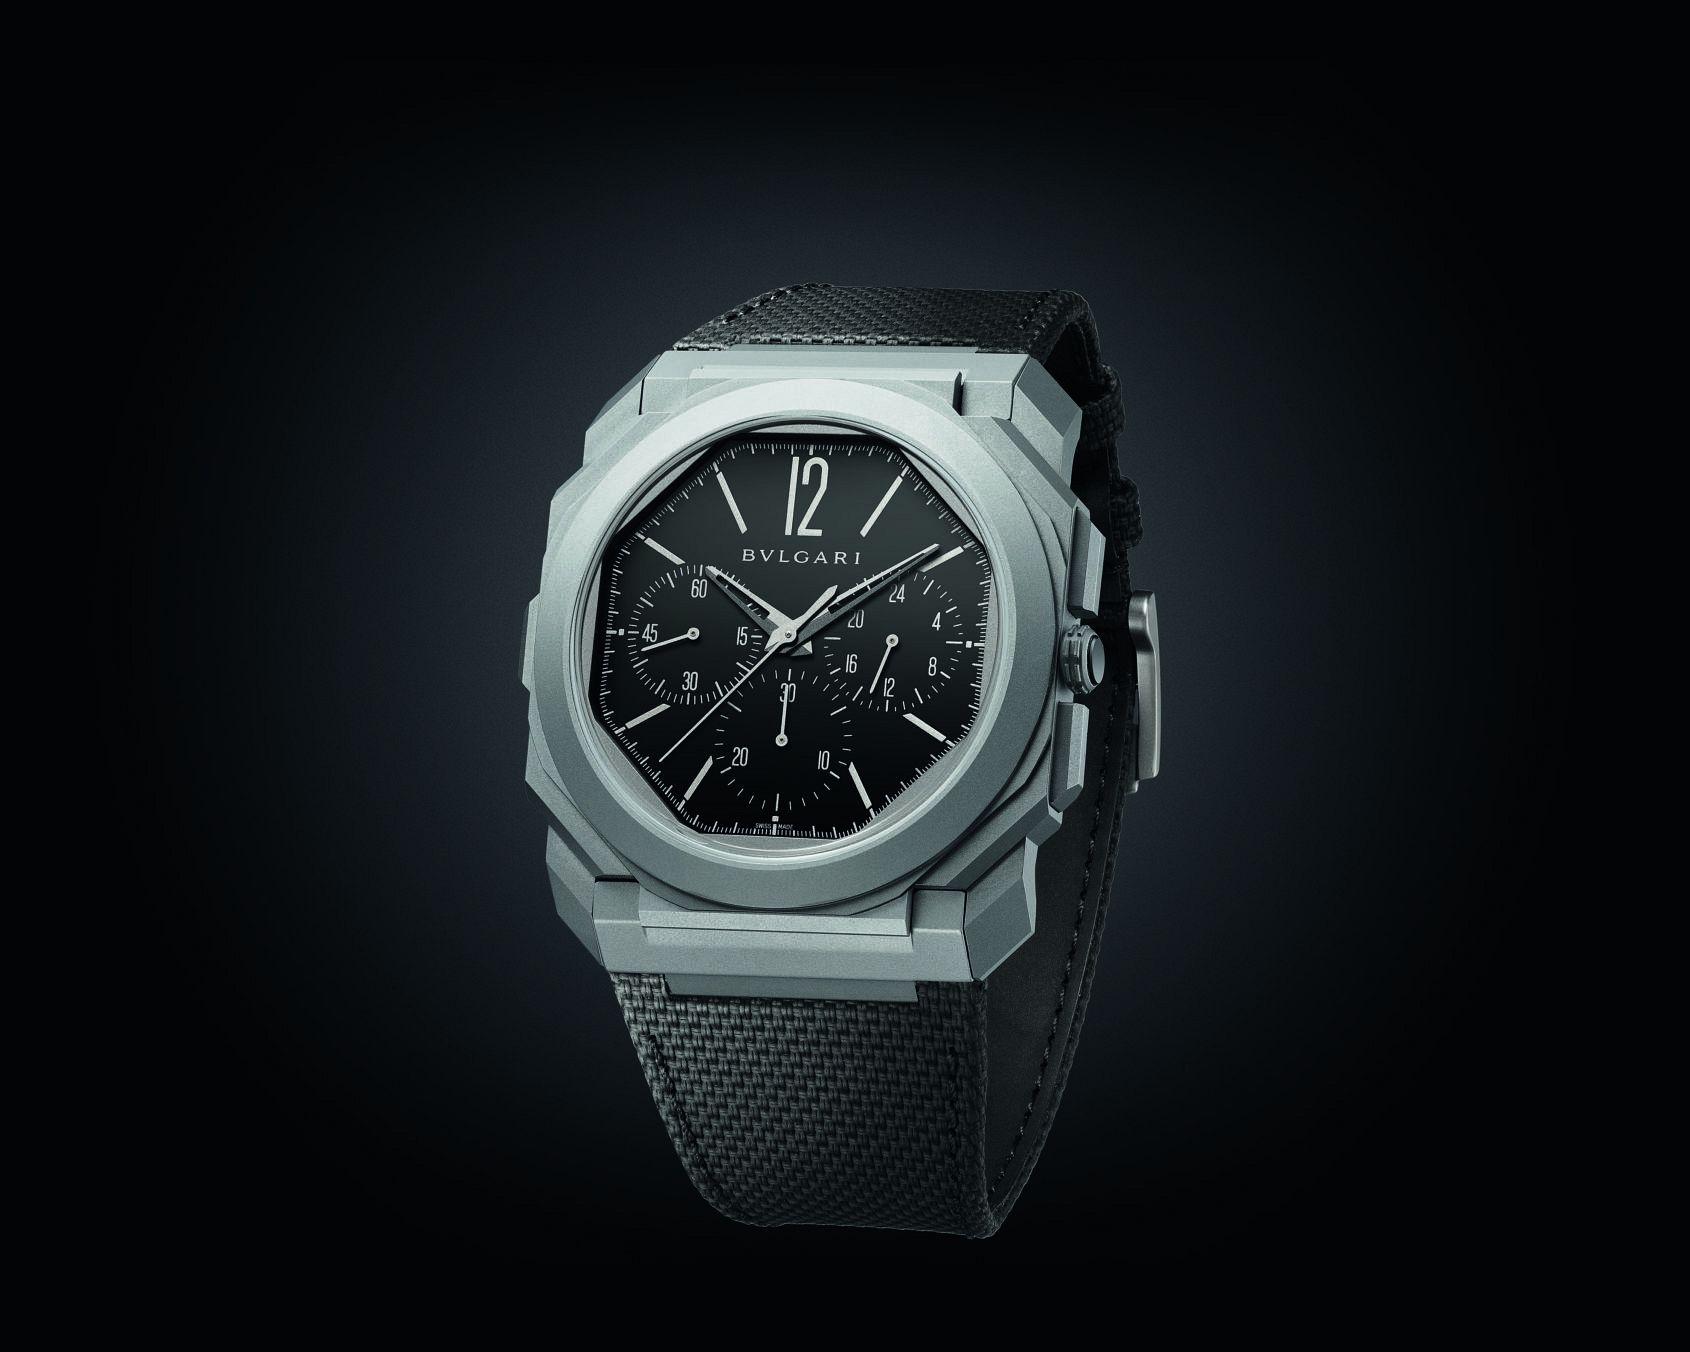 INTRODUCING: The Bulgari Octo Finissimo Chronograph GMT Titanium Black Dial bounces into town on a rubber strap